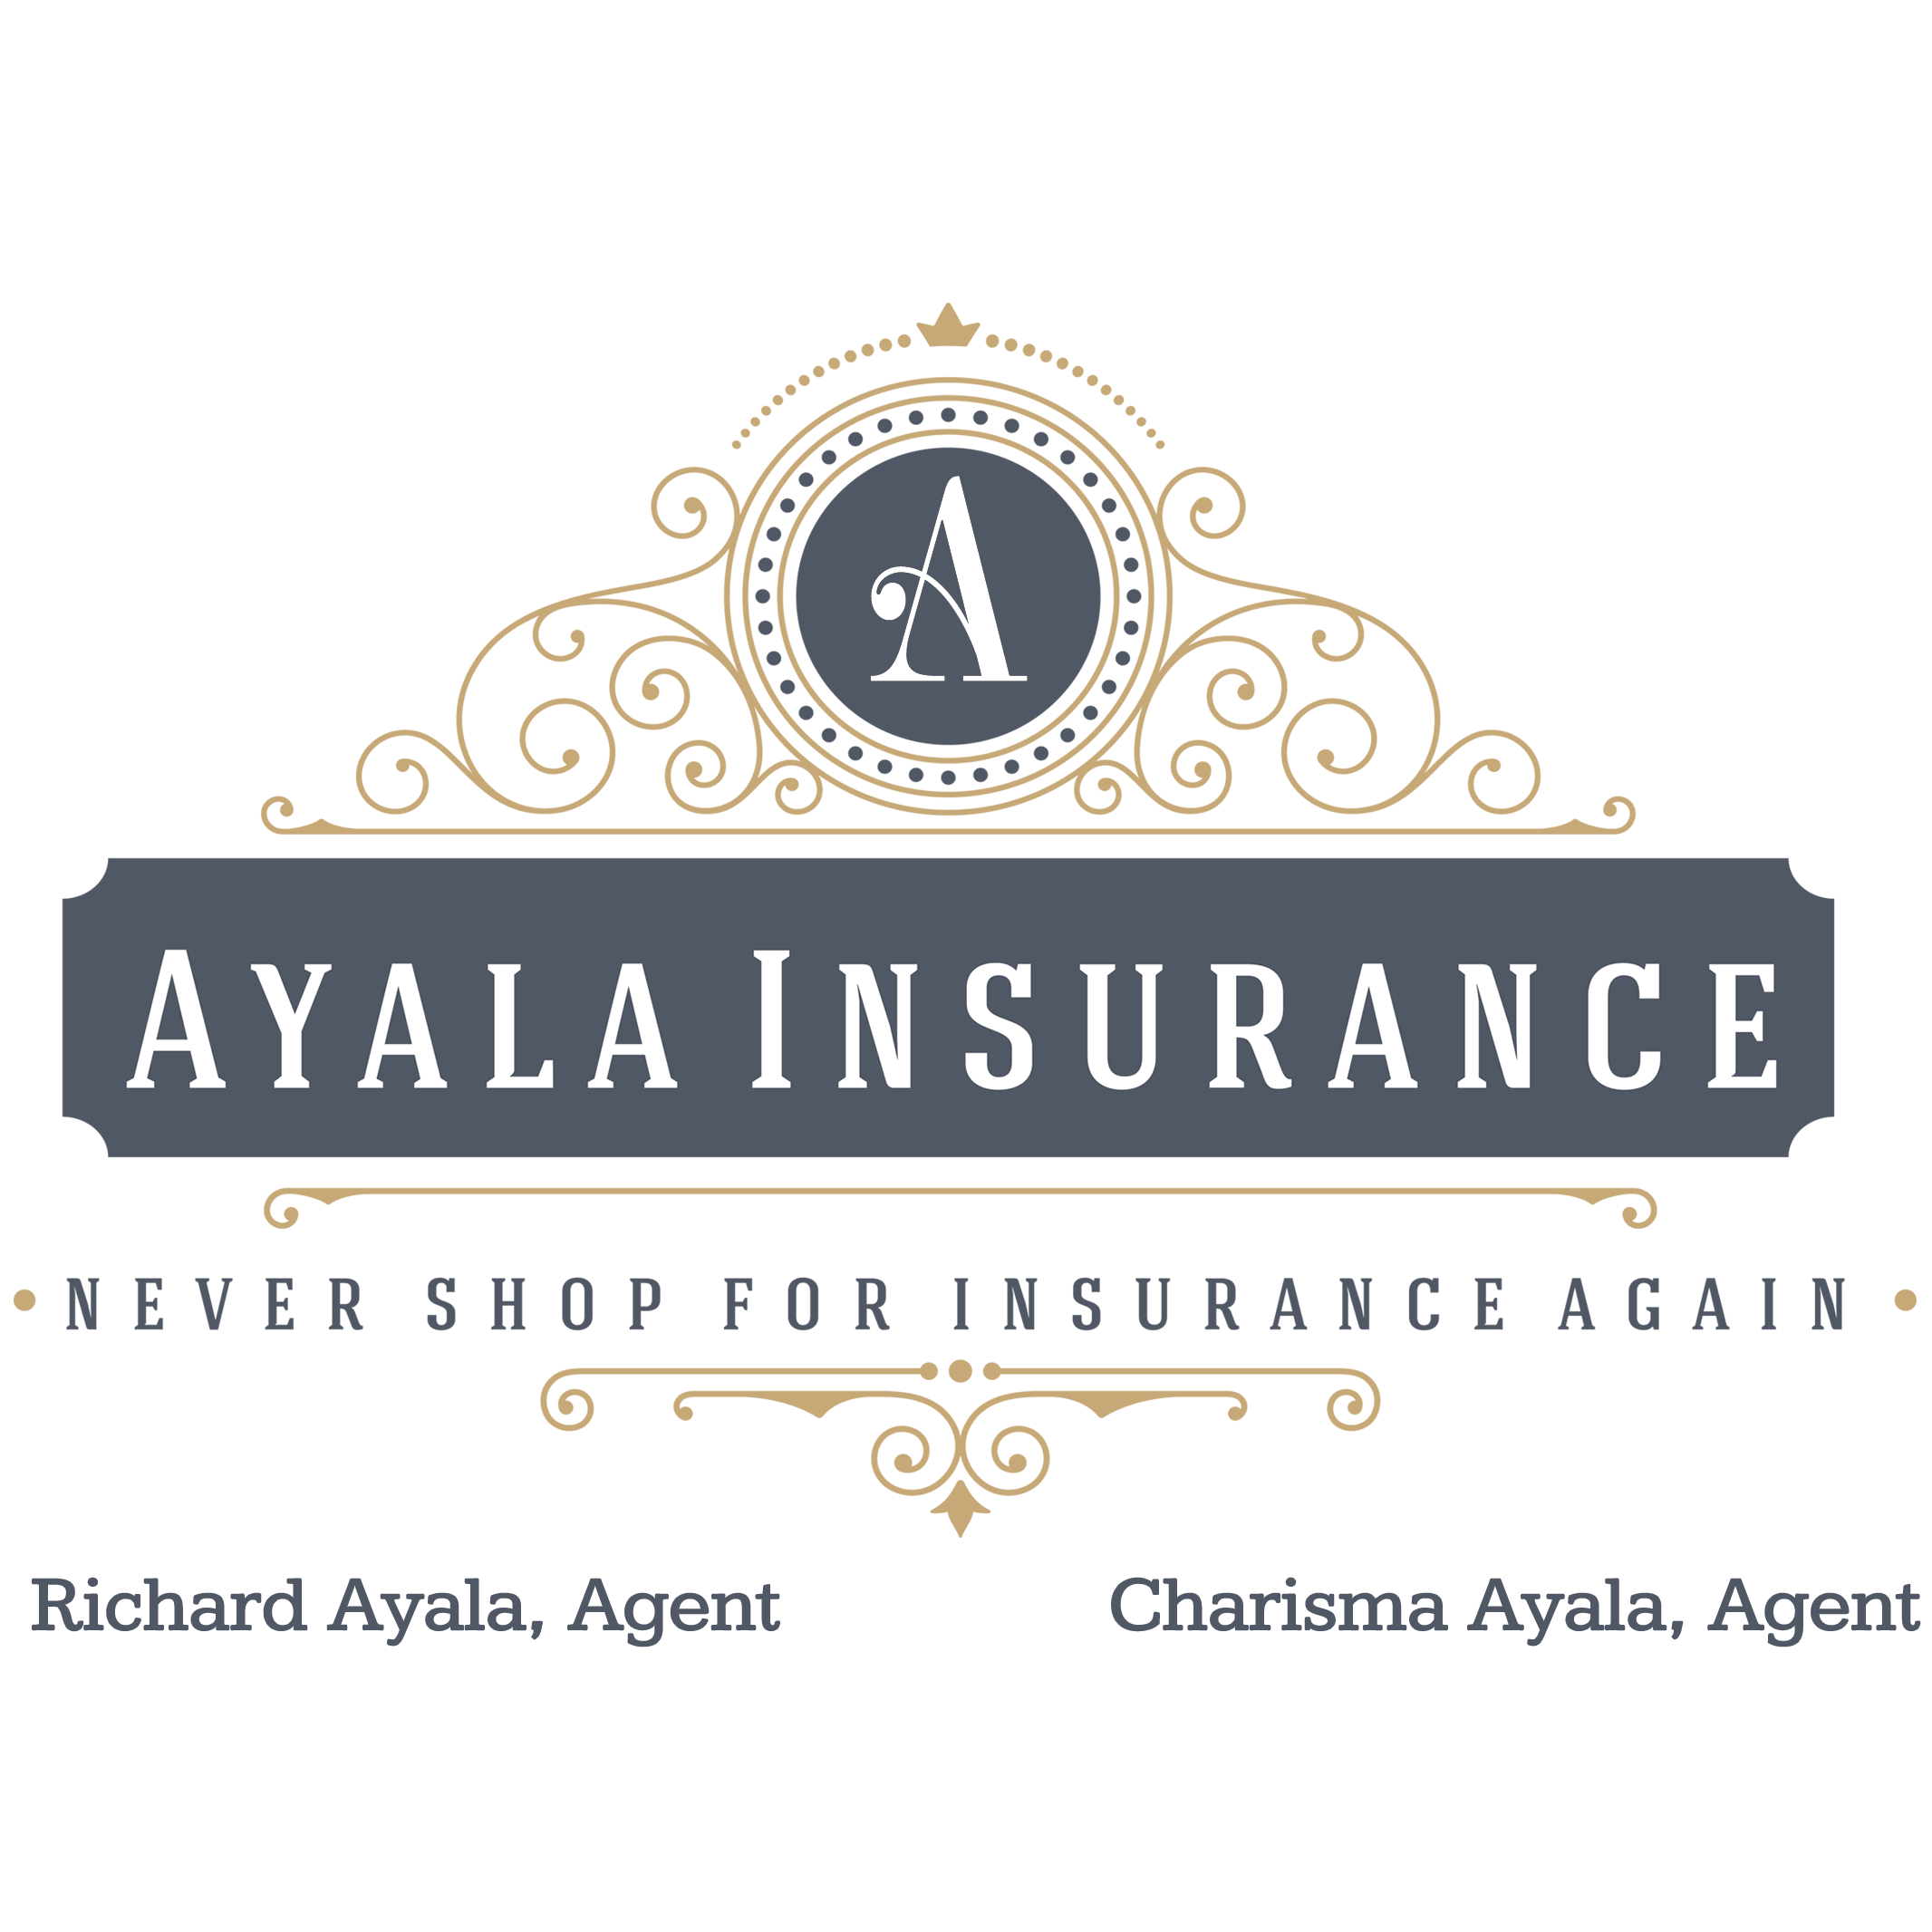 Richard Ayala Insurance Agency - Houstone, TX 77096 - (832)651-3530 | ShowMeLocal.com